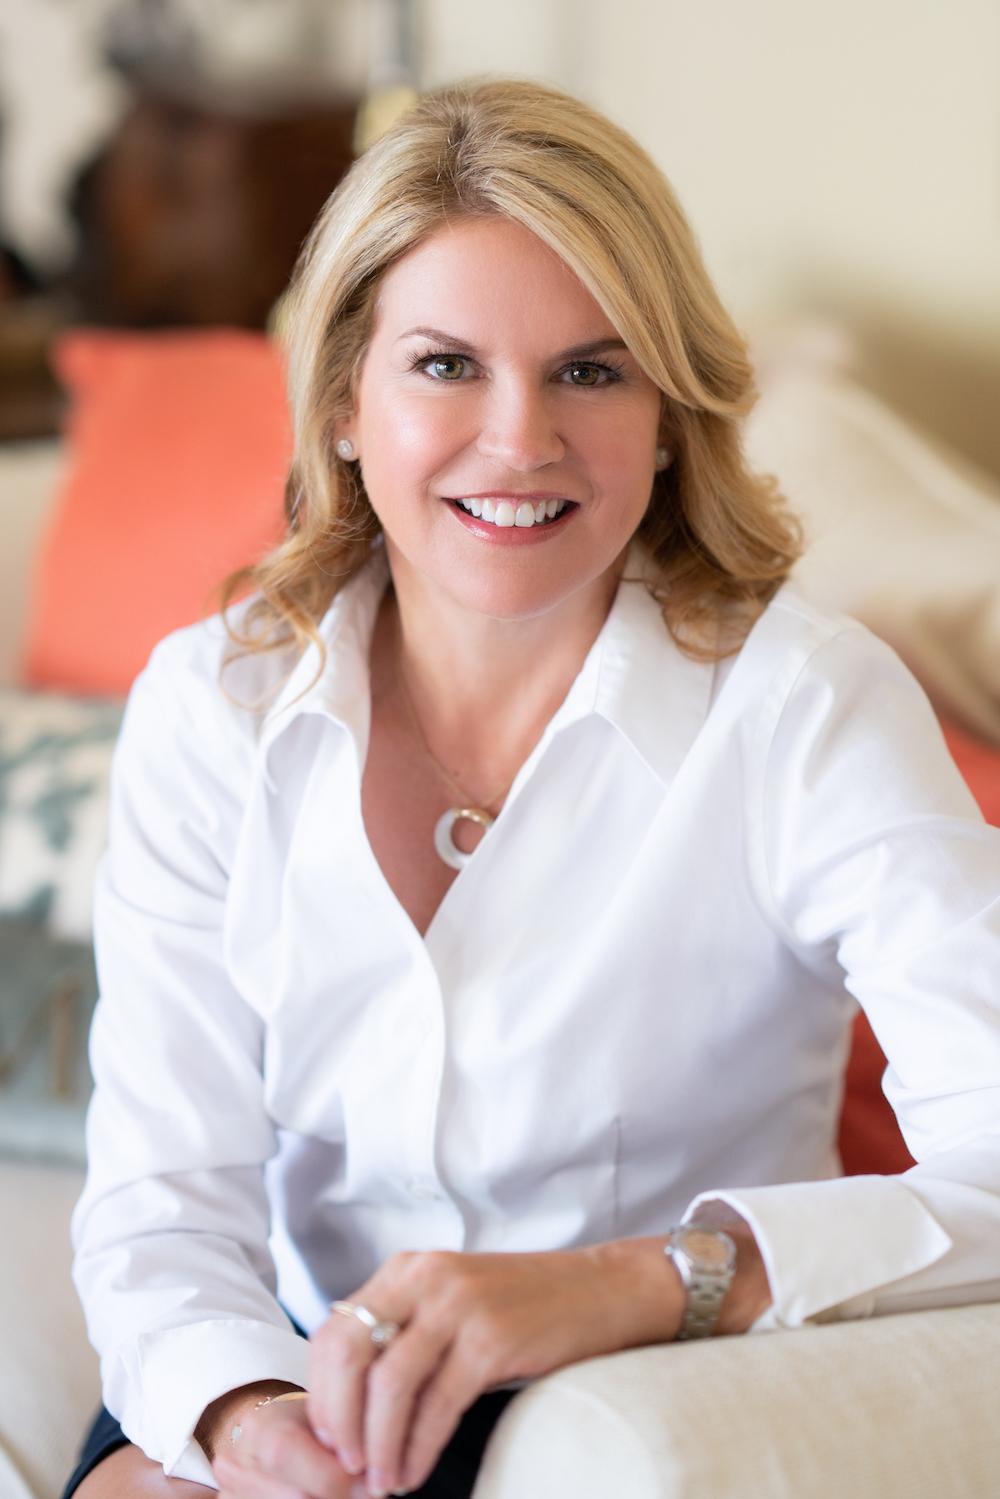 Dr. Michelle K. Johnston, Leadership Consultant, Keynote Speaker, and Management Professor